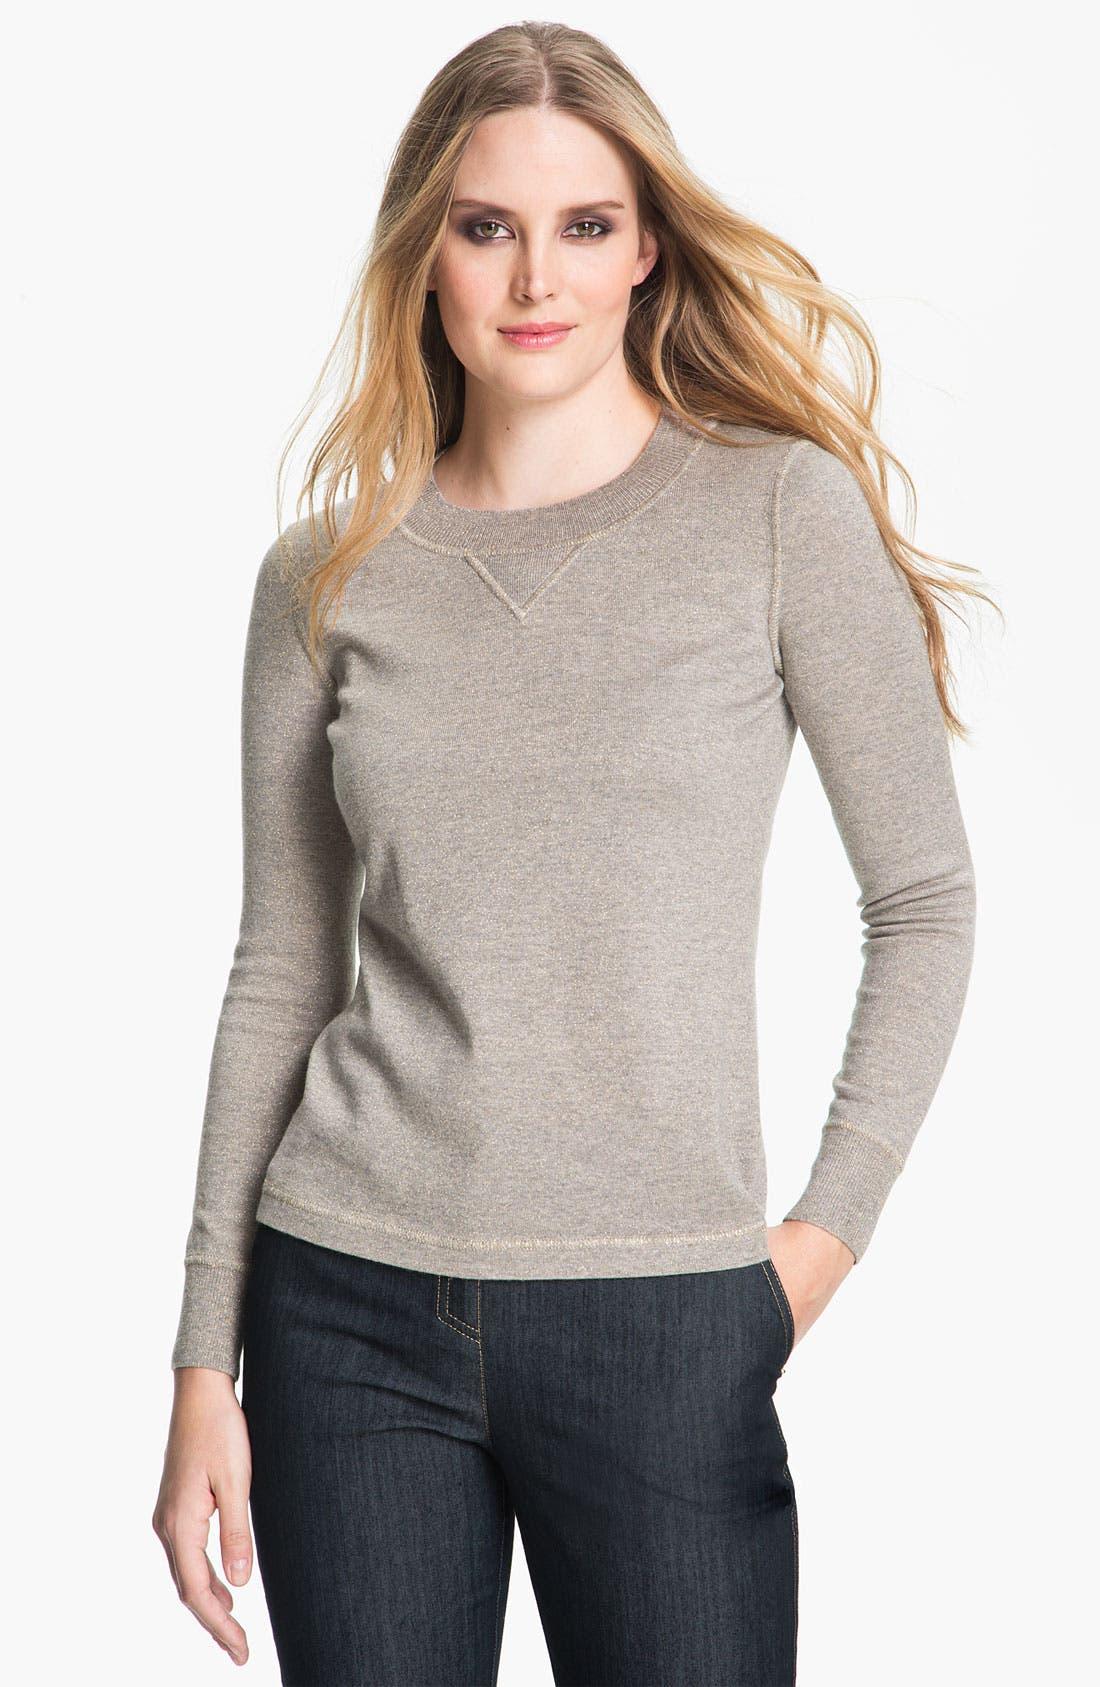 Alternate Image 1 Selected - St. John Collection Shimmer Mélange Knit Sweater